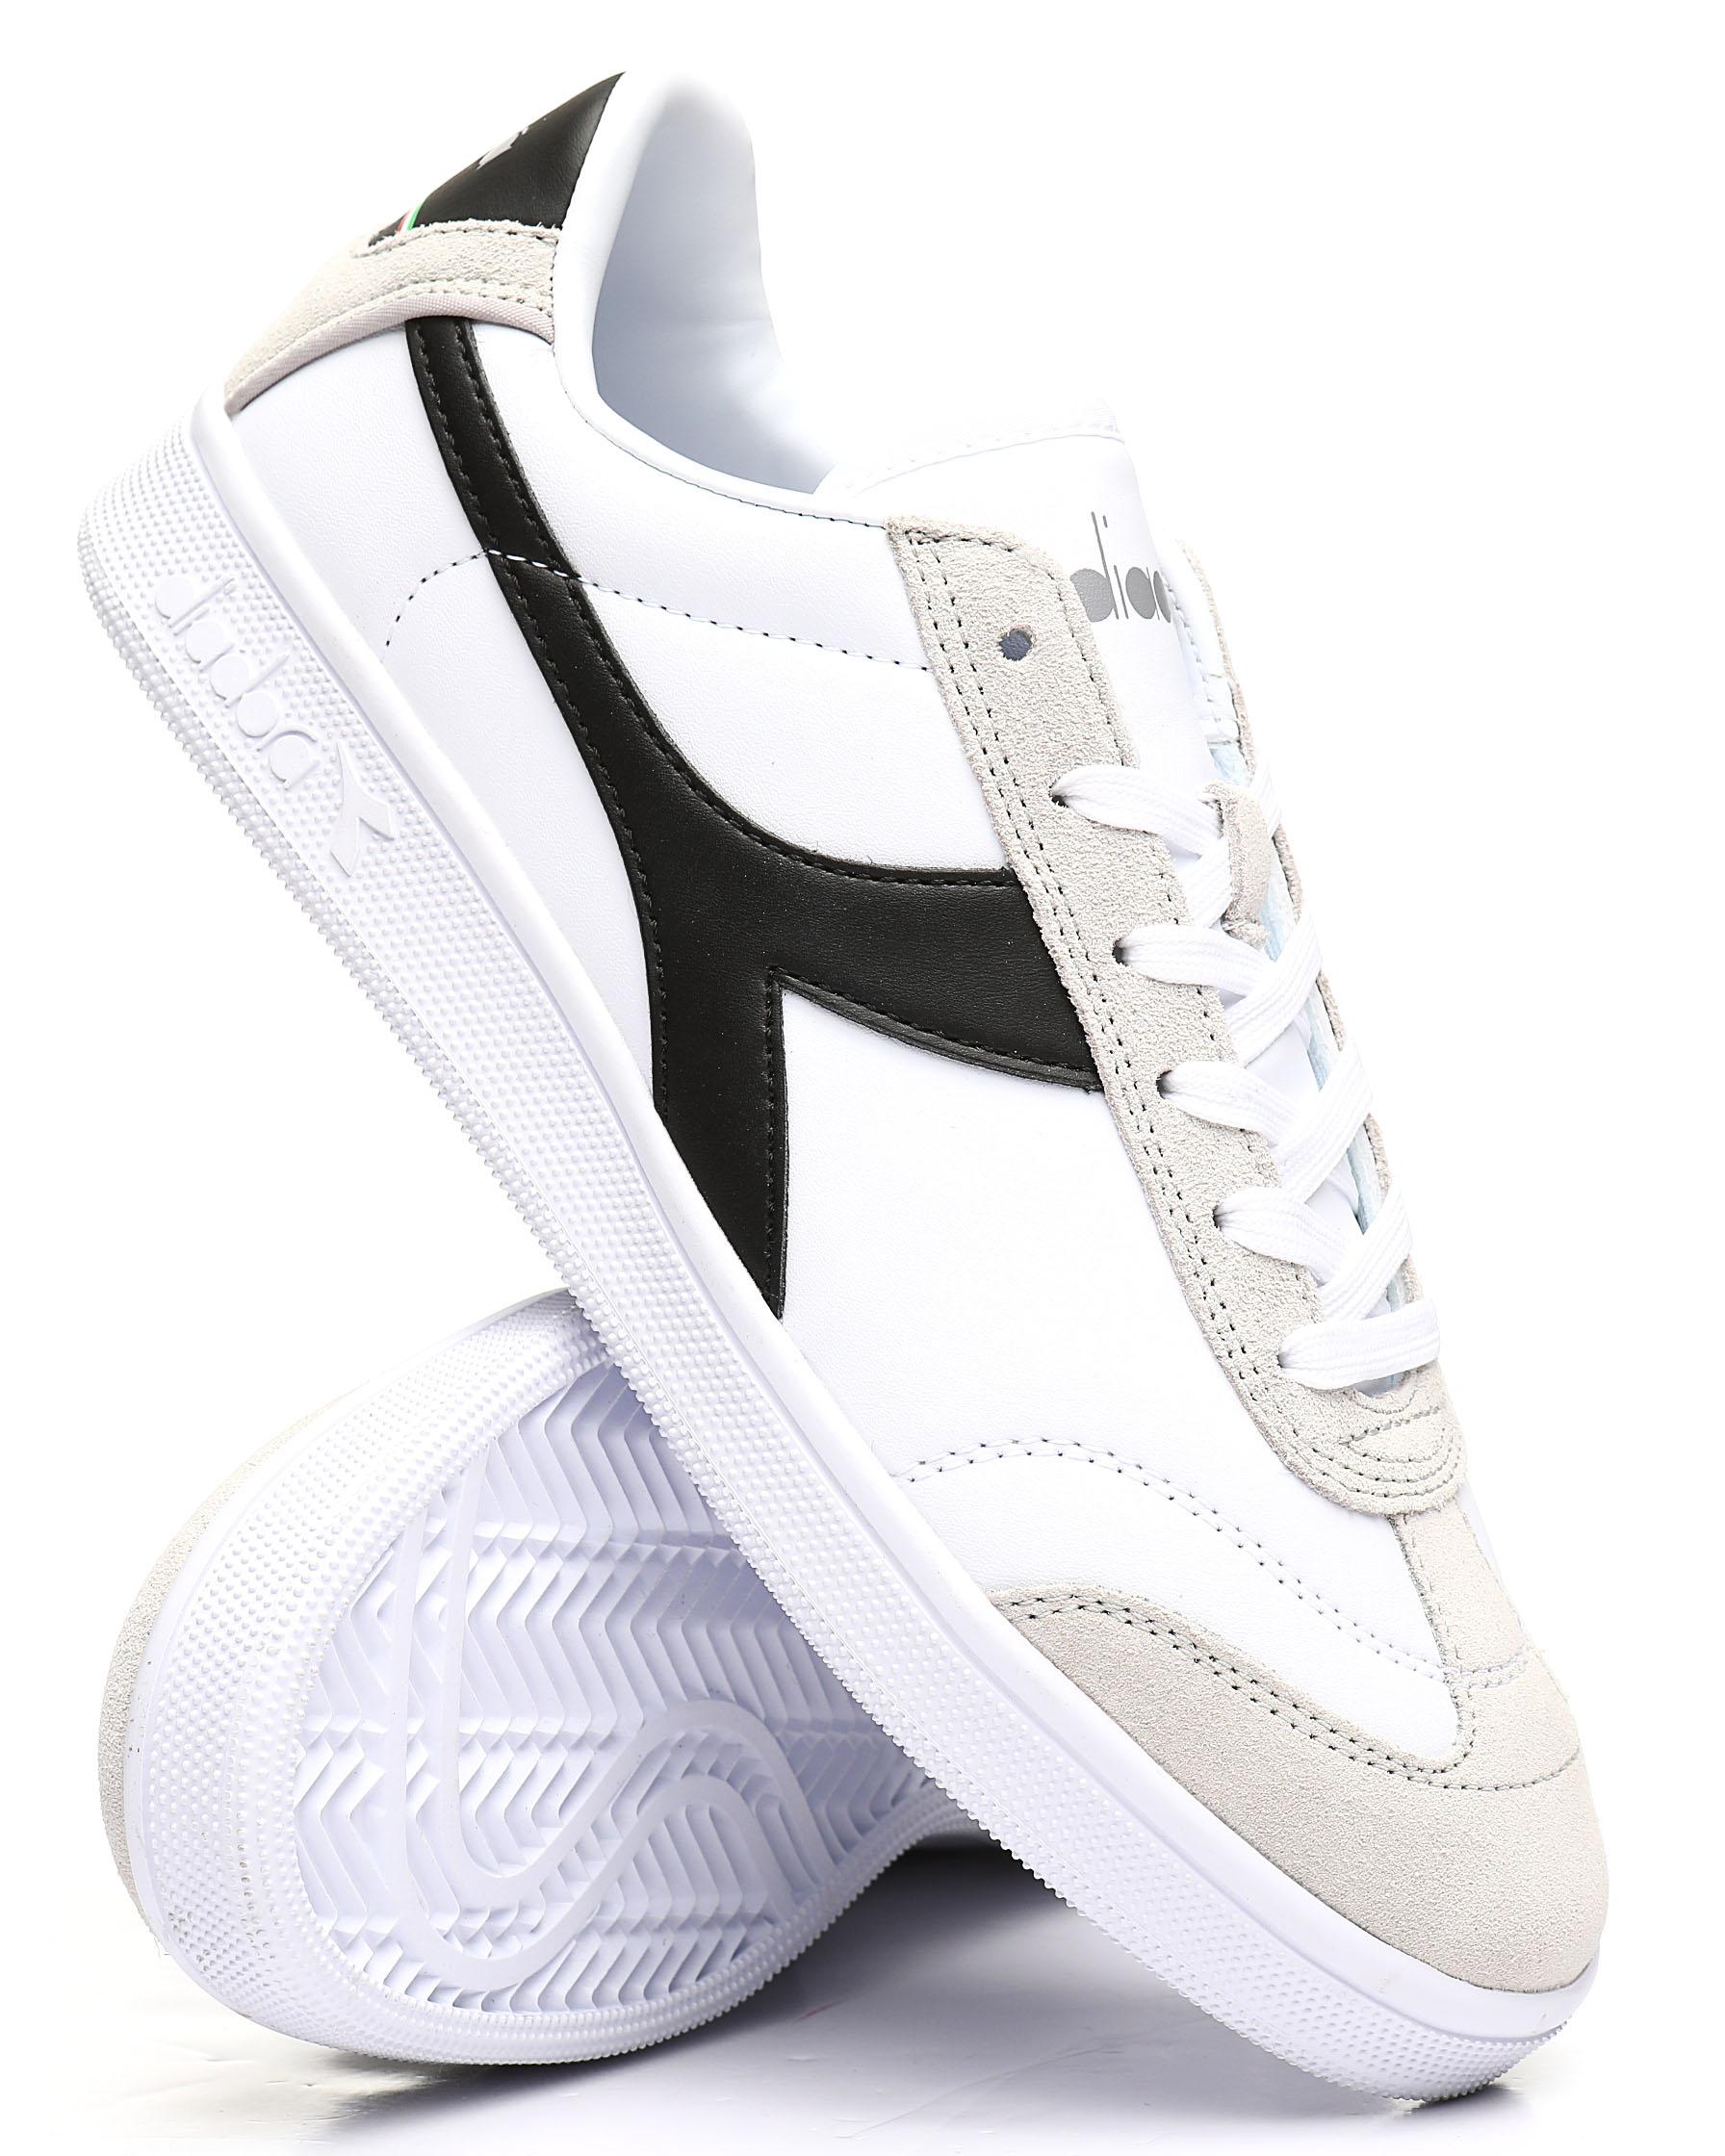 49e6785636f79 Buy Kick P Sneakers Men's Footwear from DIADORA. Find DIADORA ...